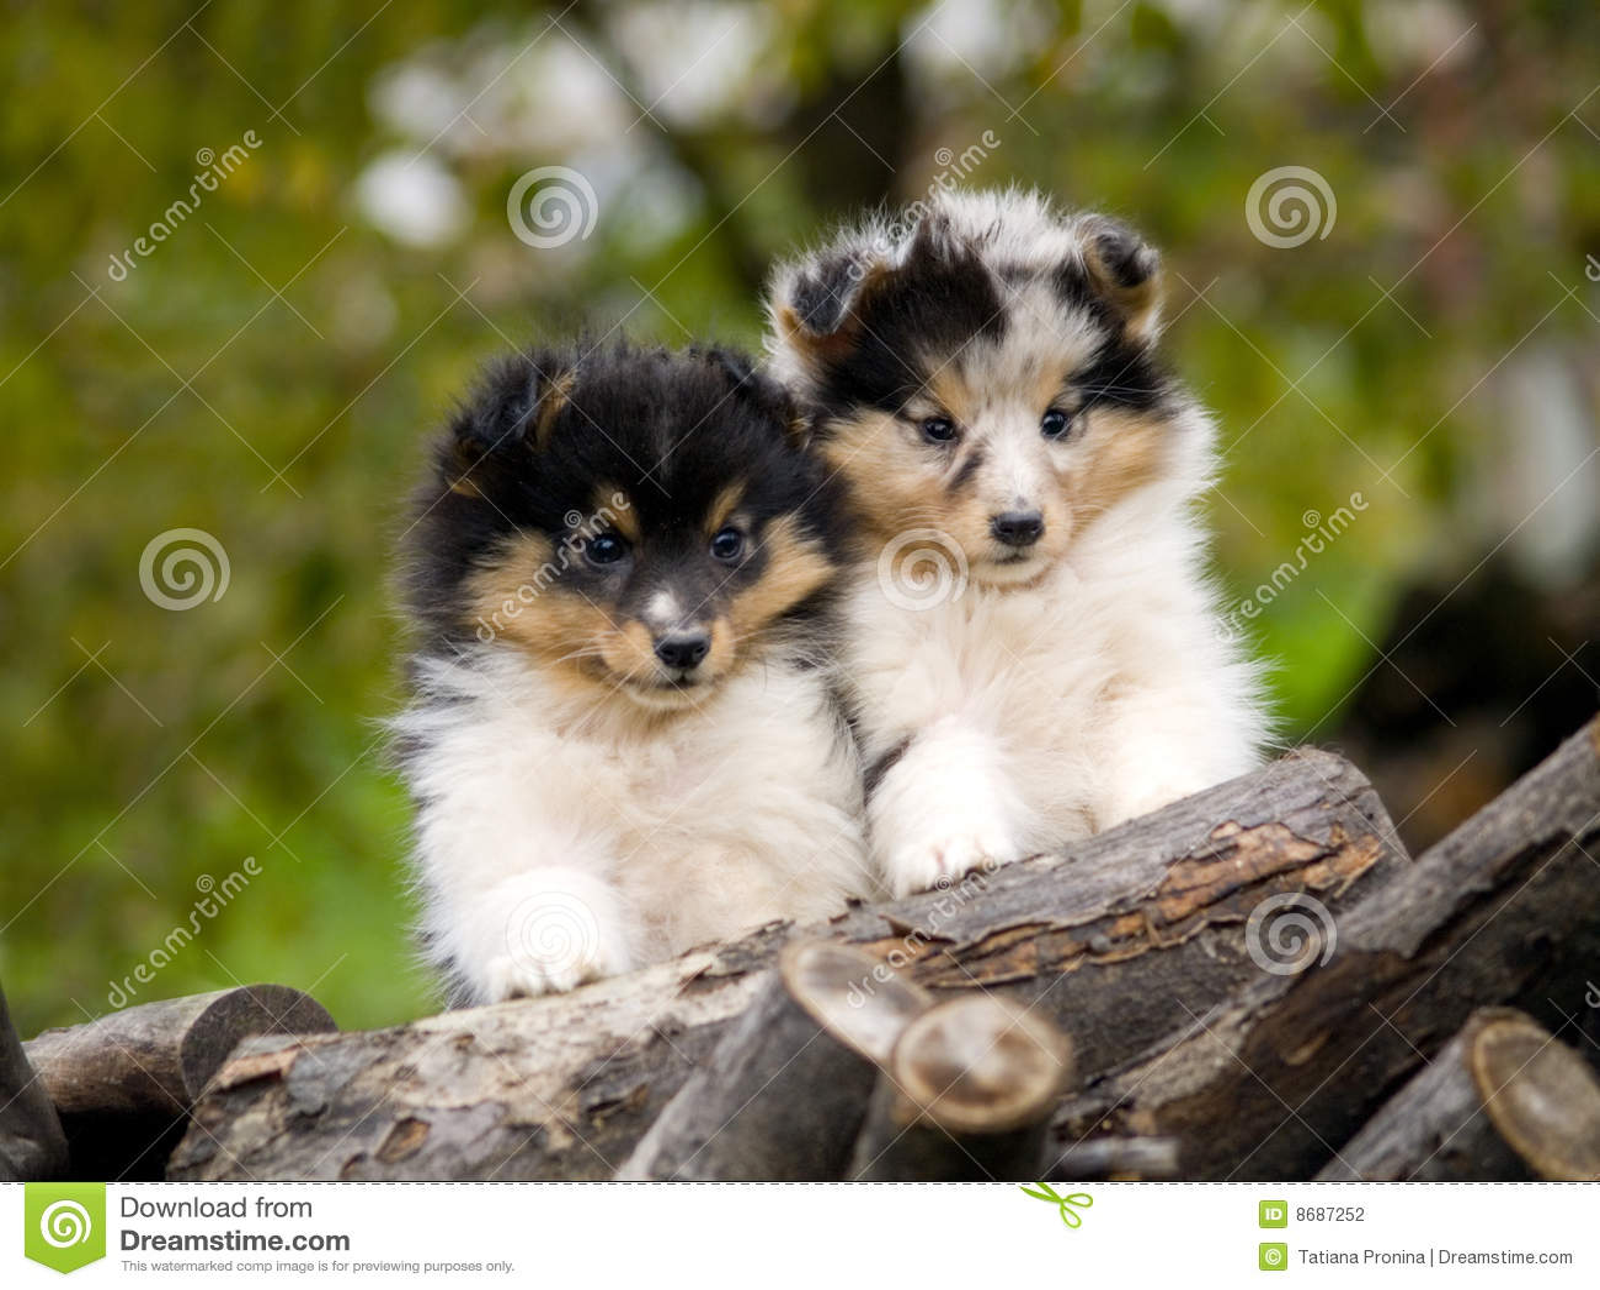 Sheltie Puppies Stock Photography - Image: 8687252